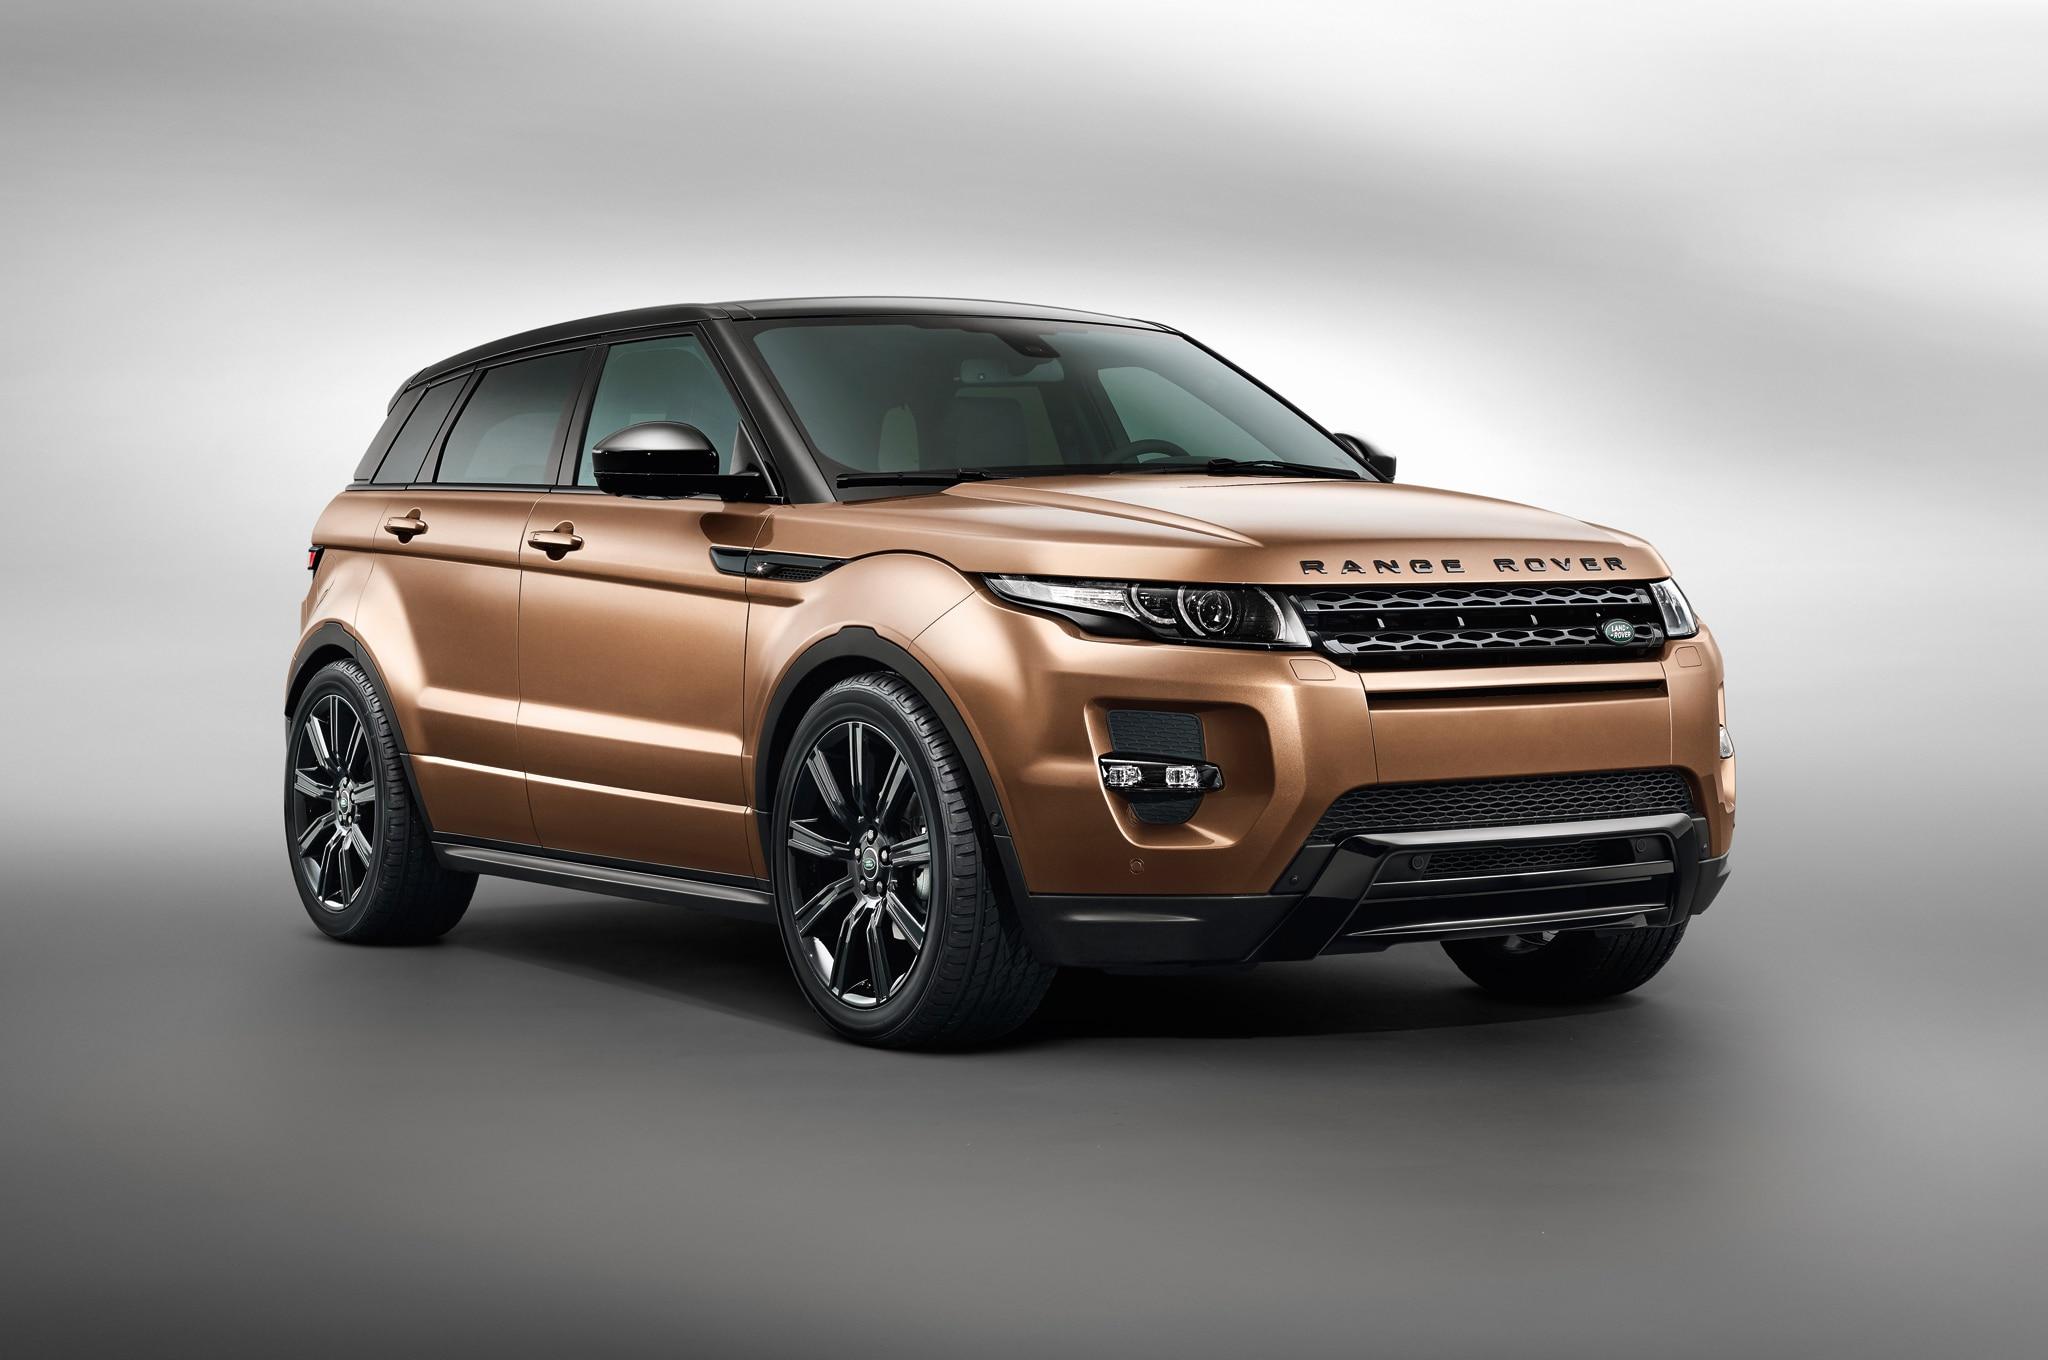 2014 Land Rover Range Rover Evoque Front Three Quarter1